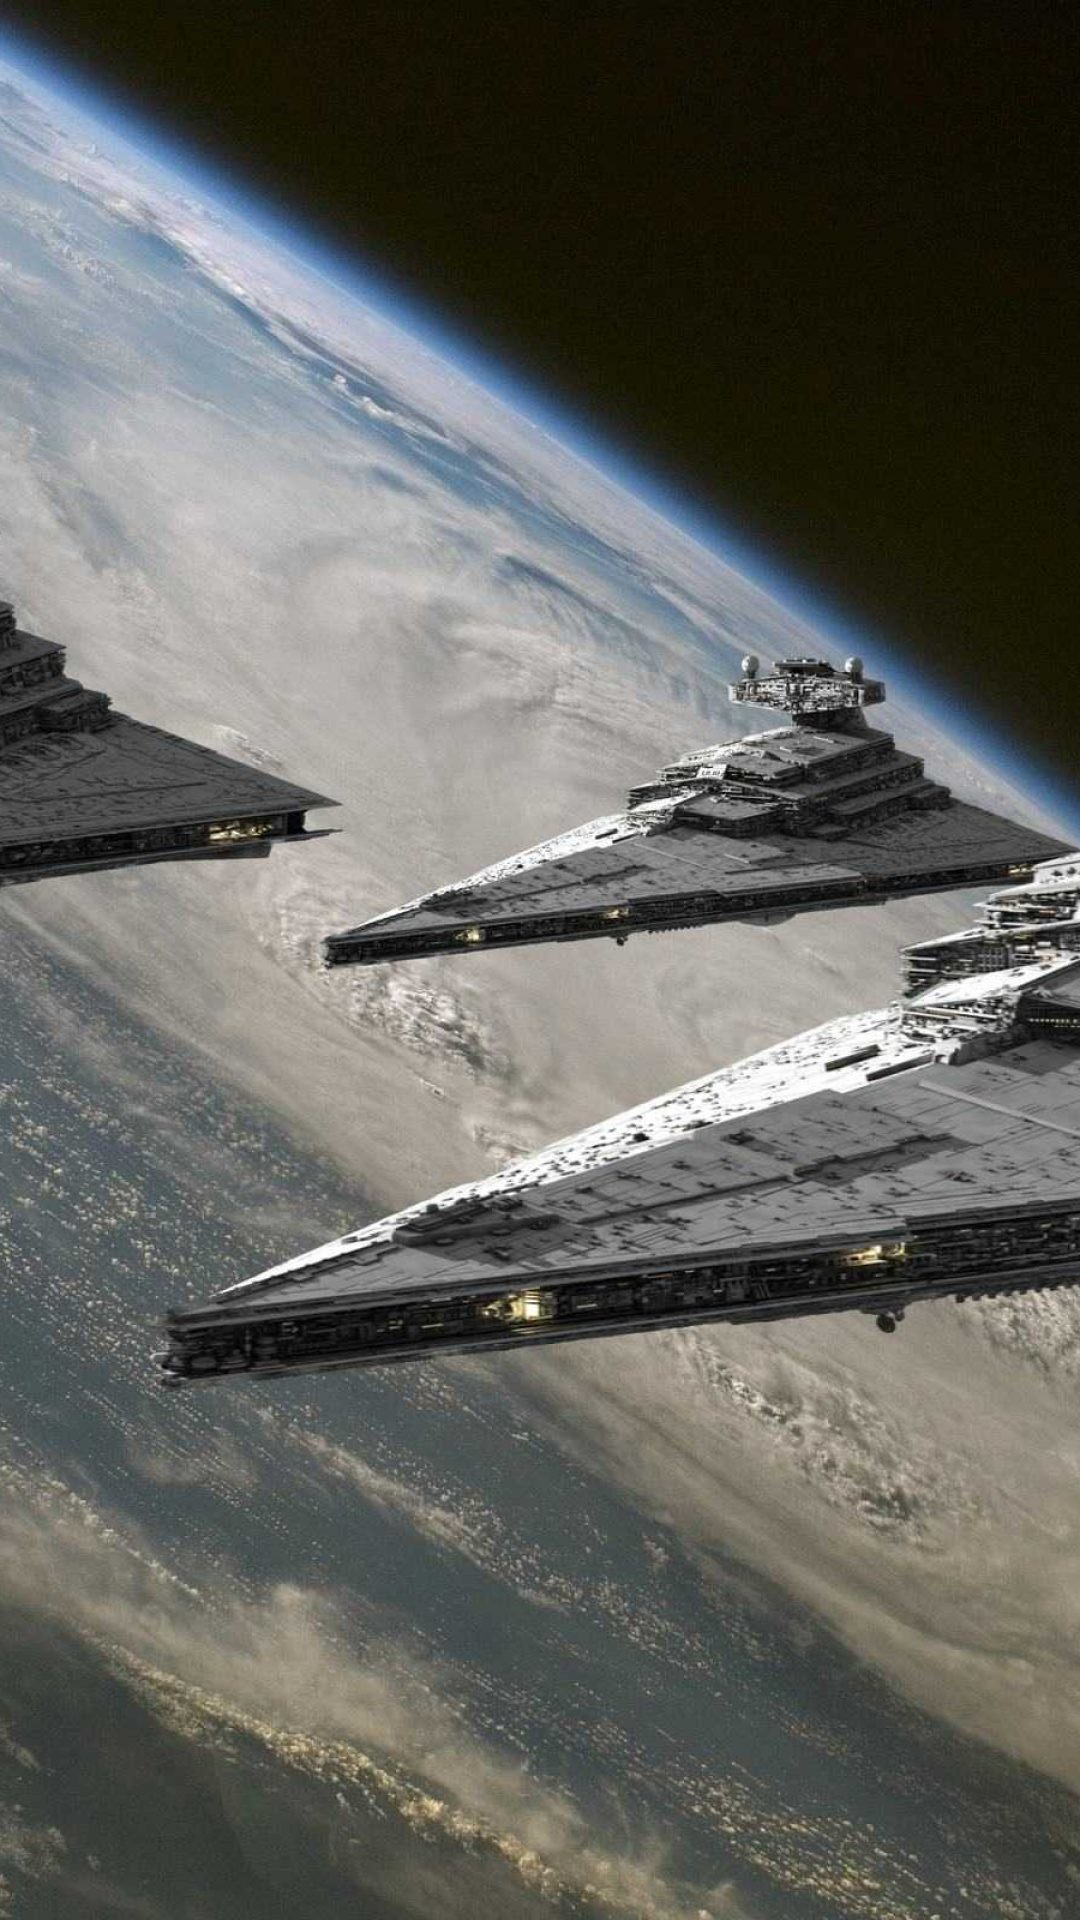 star wars hd space wallpaper